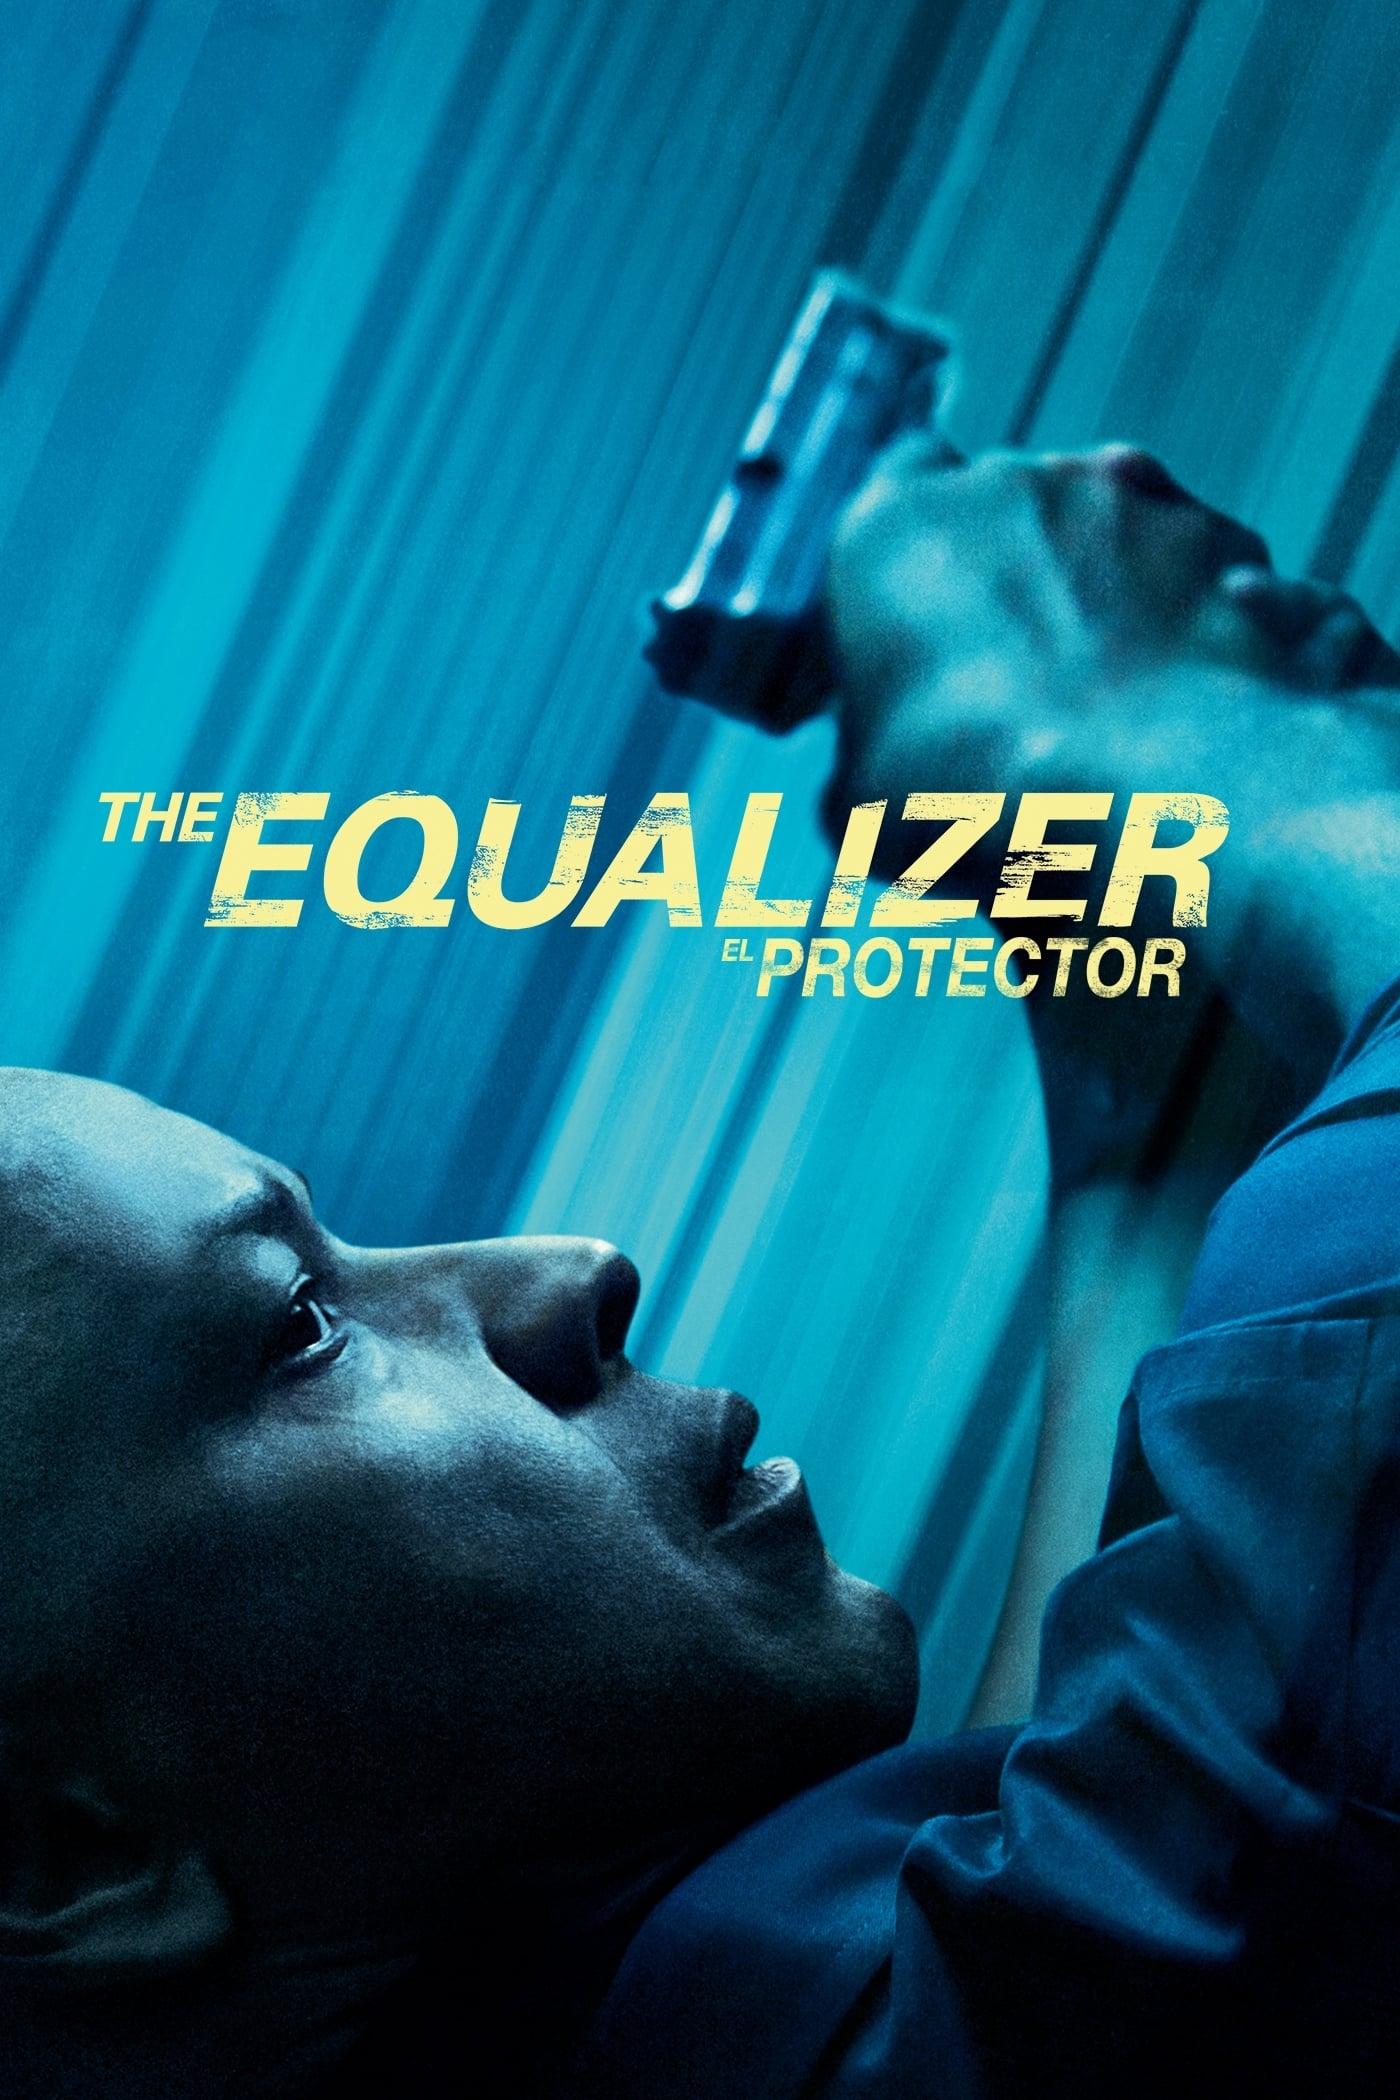 The Equalizer (El Protector) poster